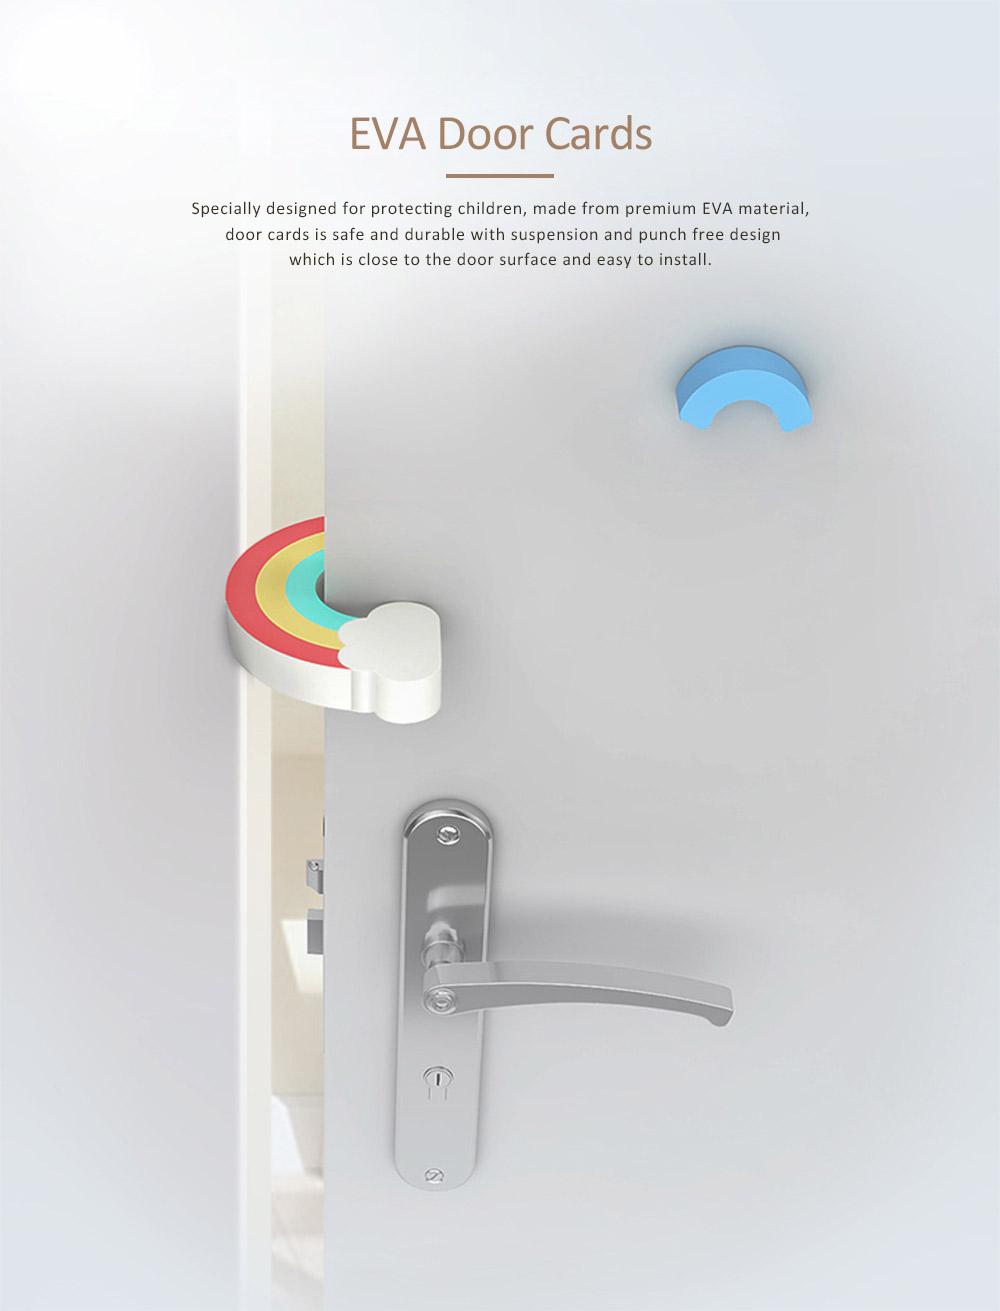 Child Safety Door Bumper Clip, Door Cards With Suspension Design For Bedrooms, Bathrooms & Kitchens 0